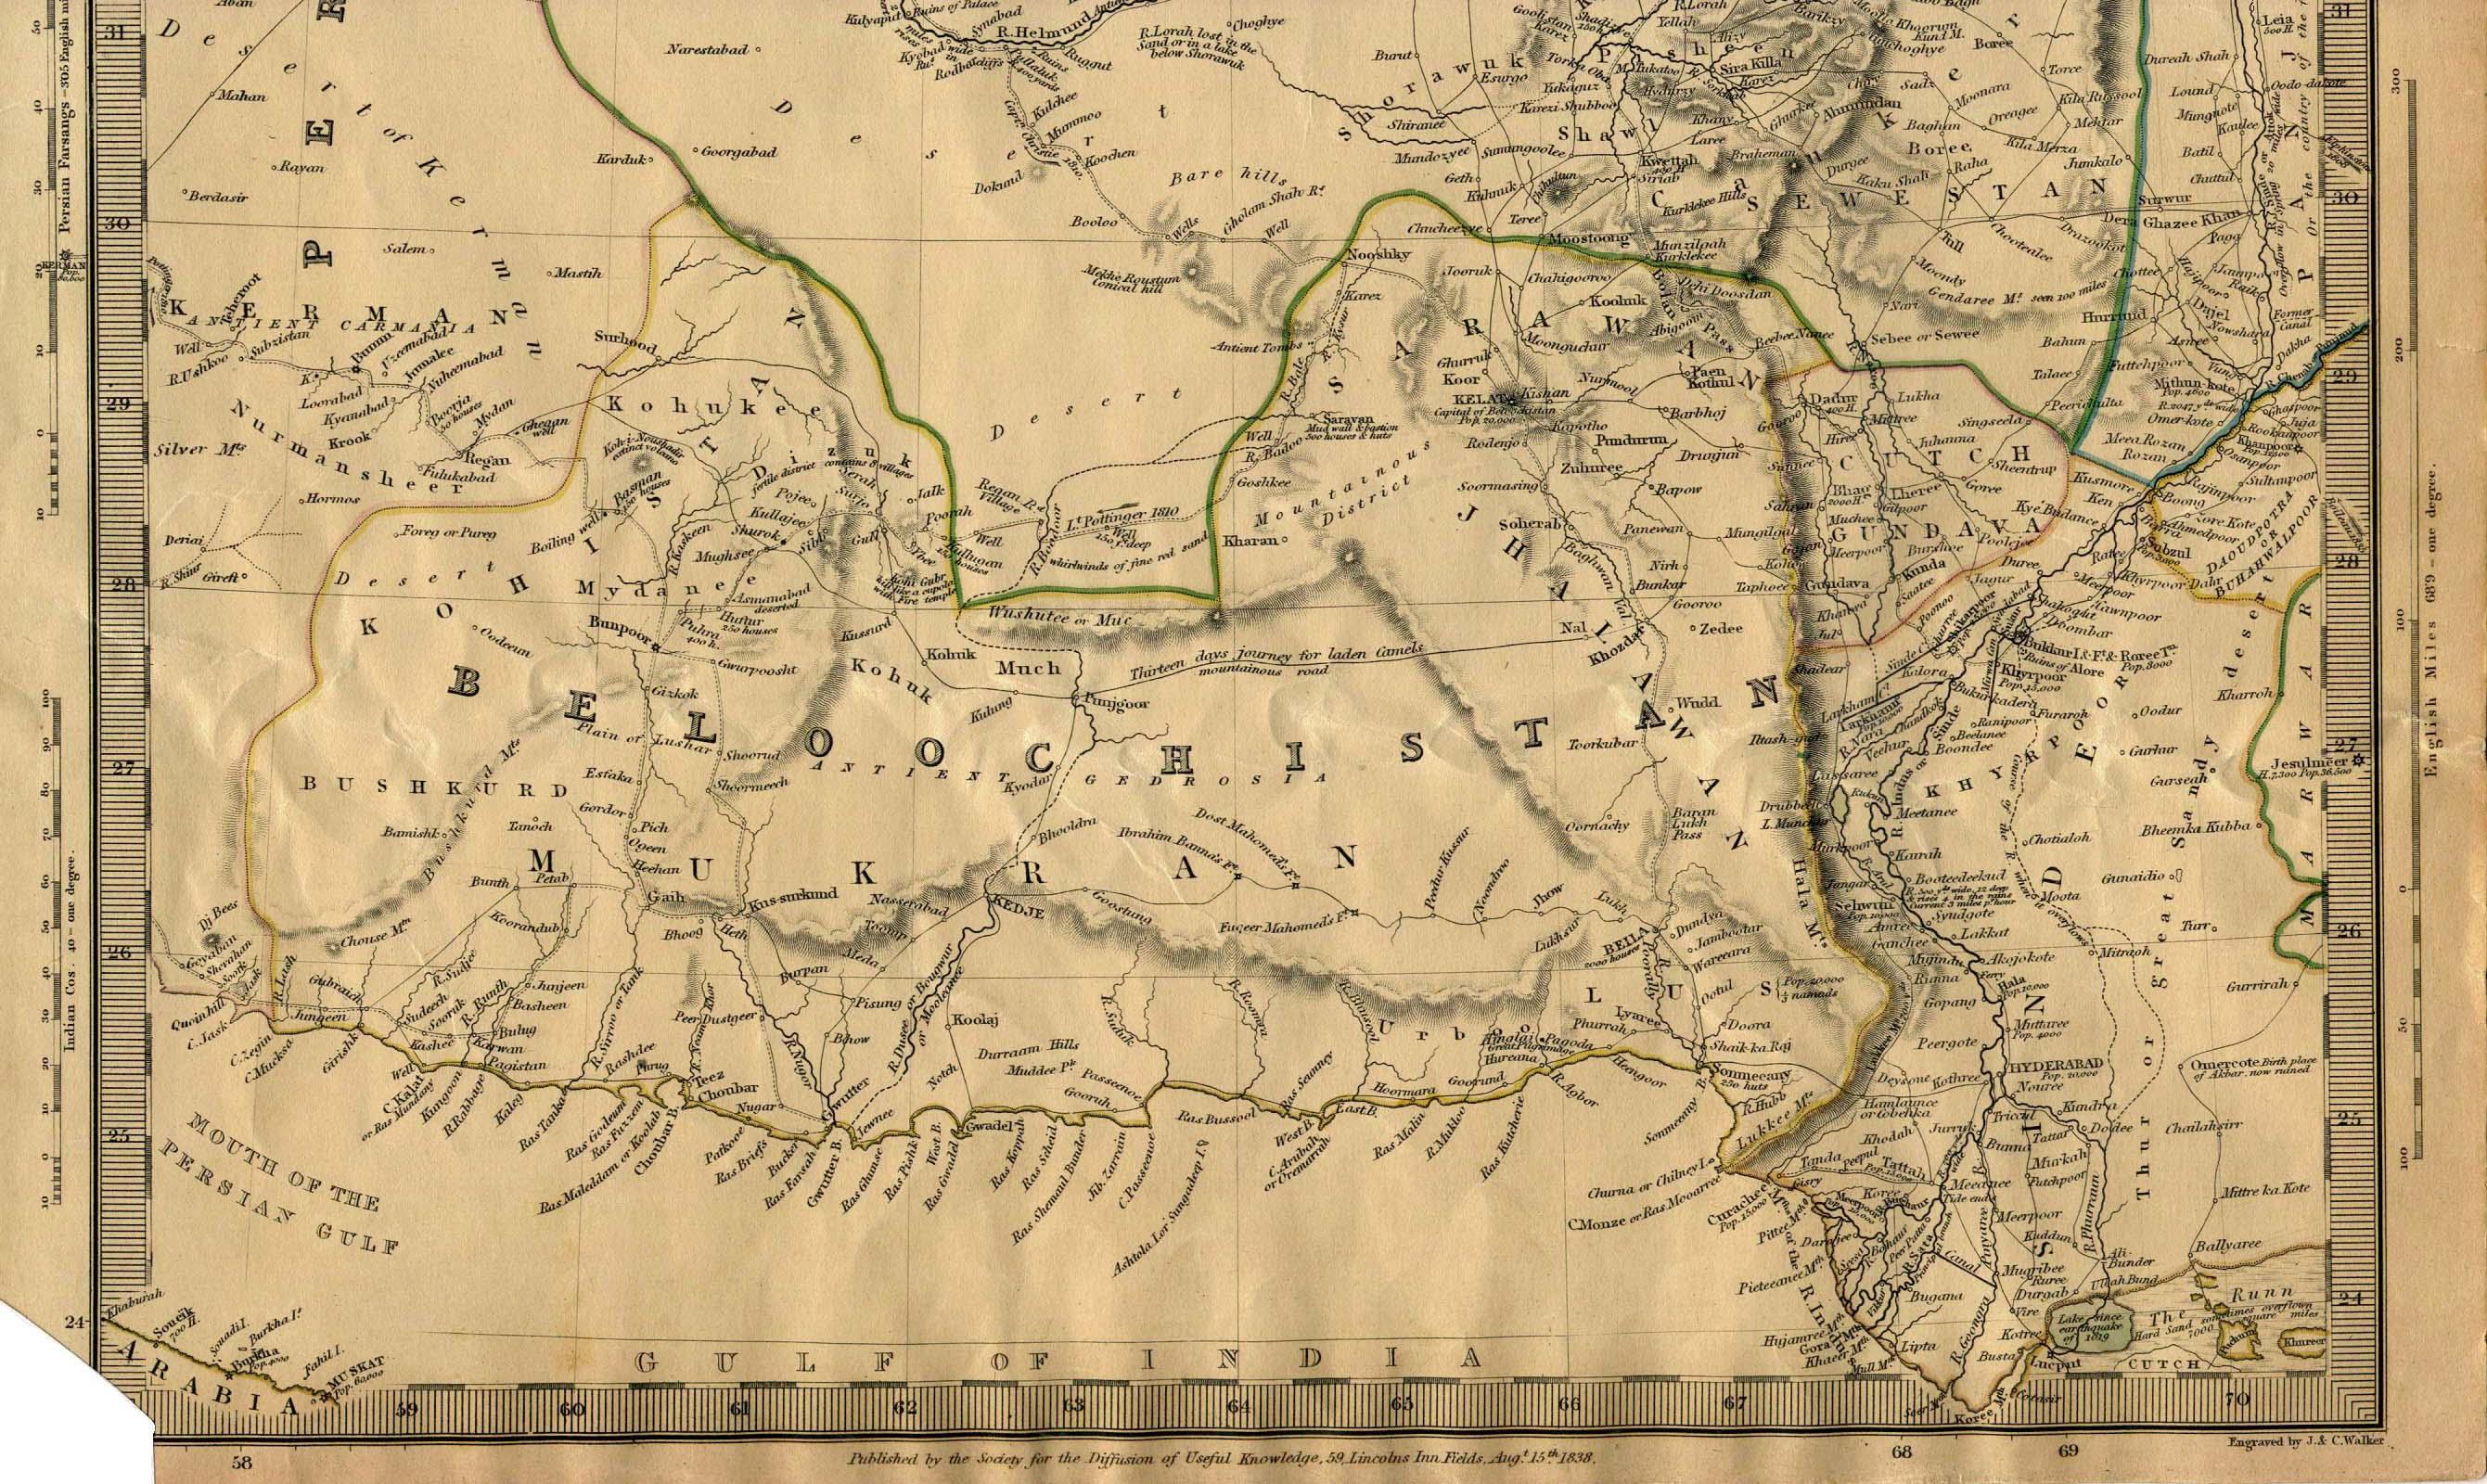 Mapa de la Parte Sur de Bokhara, Cabool, Beloochistan, 1838.